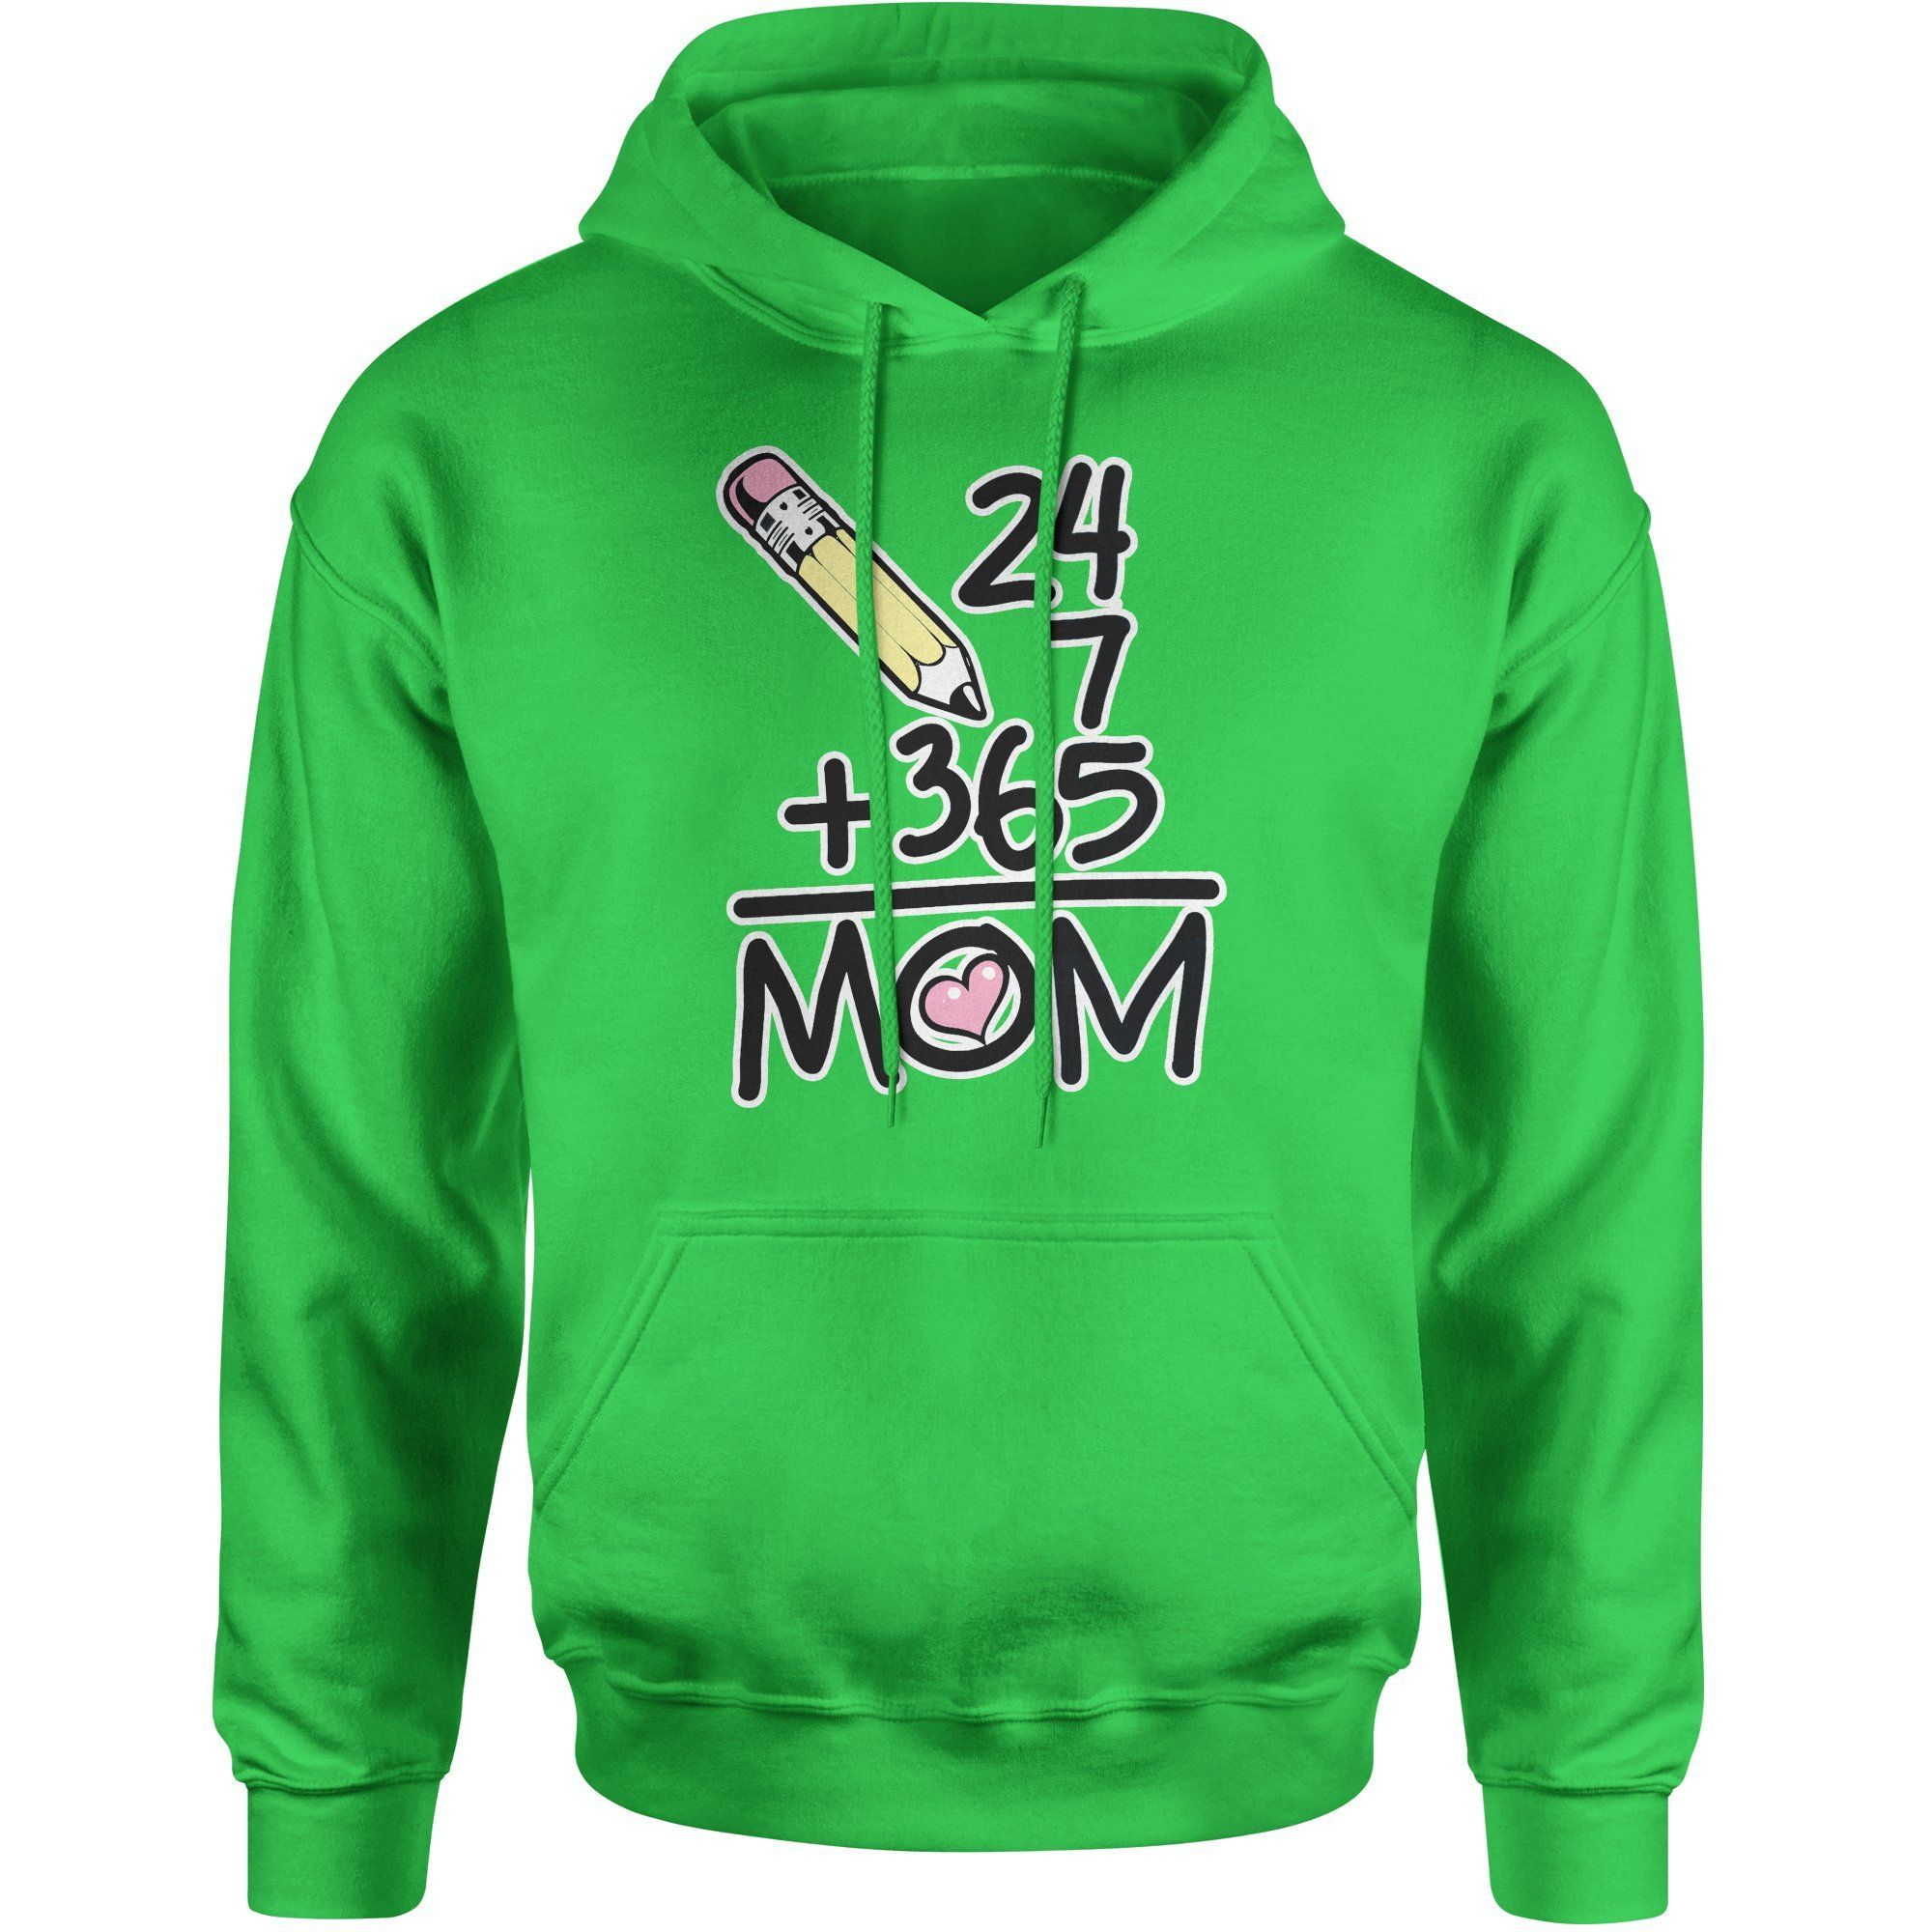 Mothers Day - 24+7+365= Mom Adult Hoodie Sweatshirt